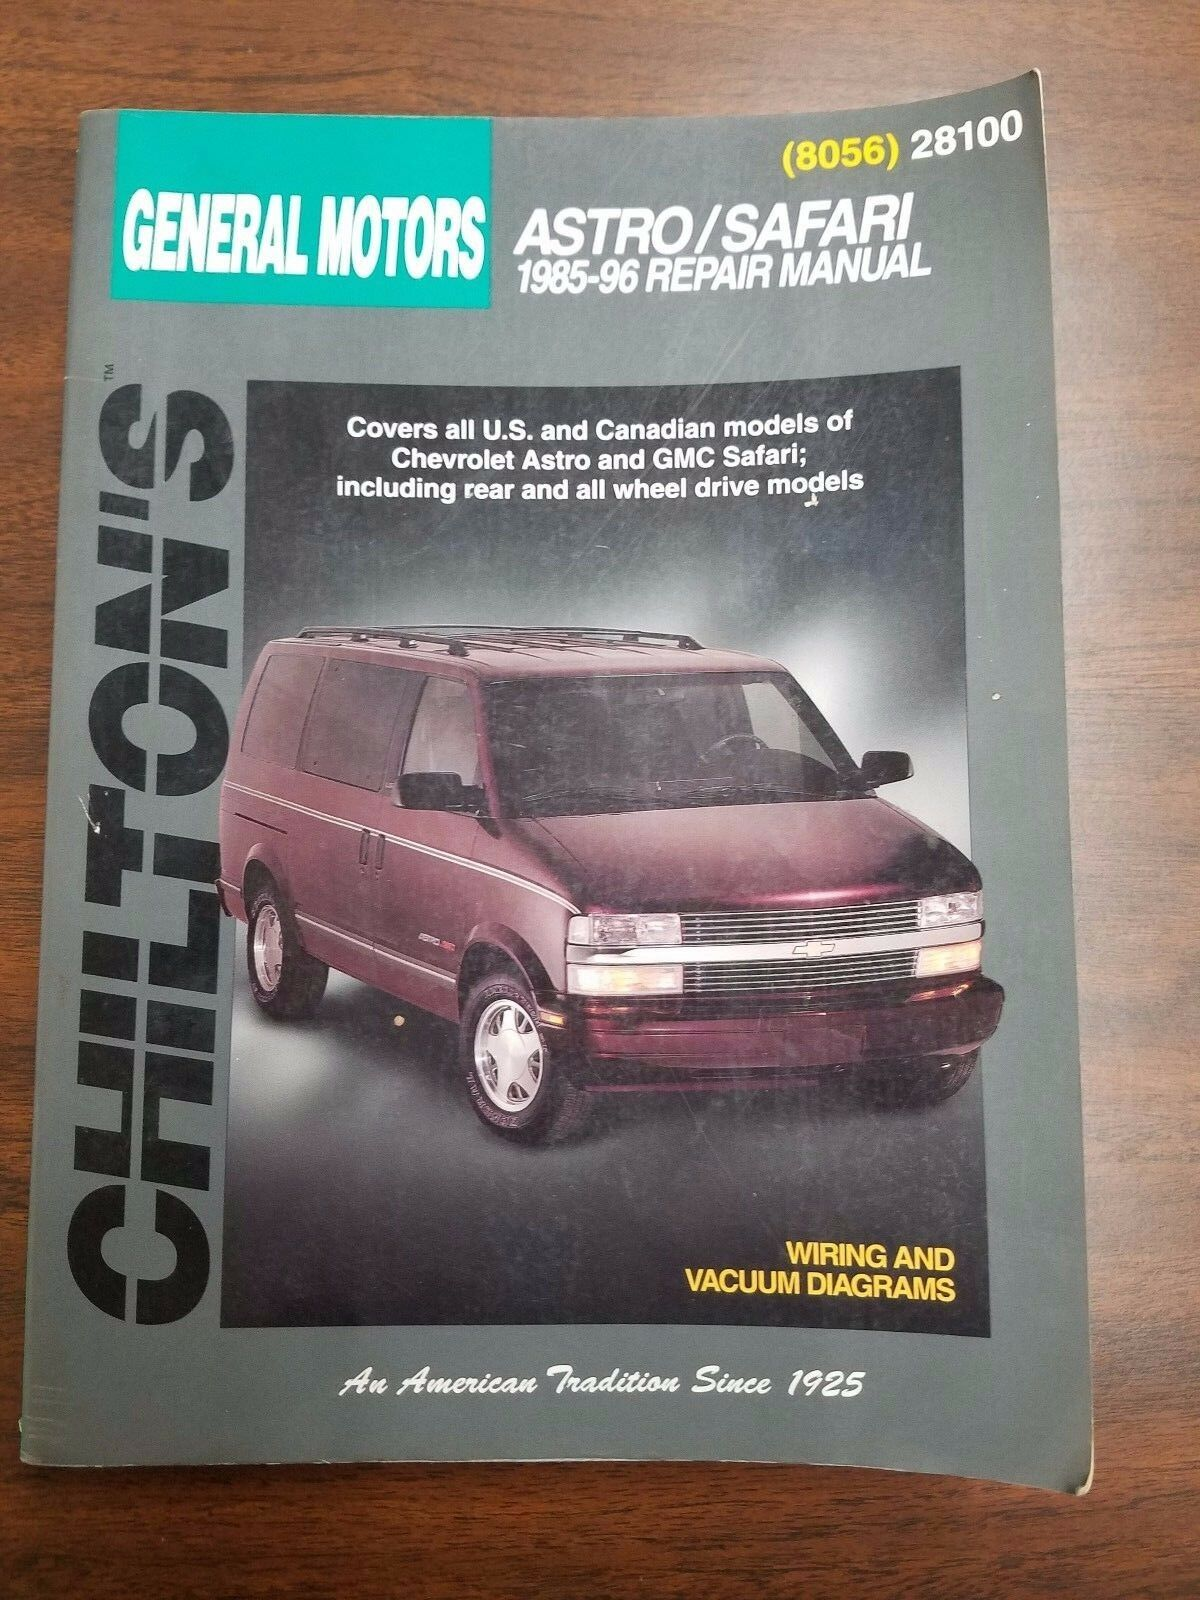 Chilton General Motors Astro Safari 1985-1996 Auto Repair Manual 8056 | eBay